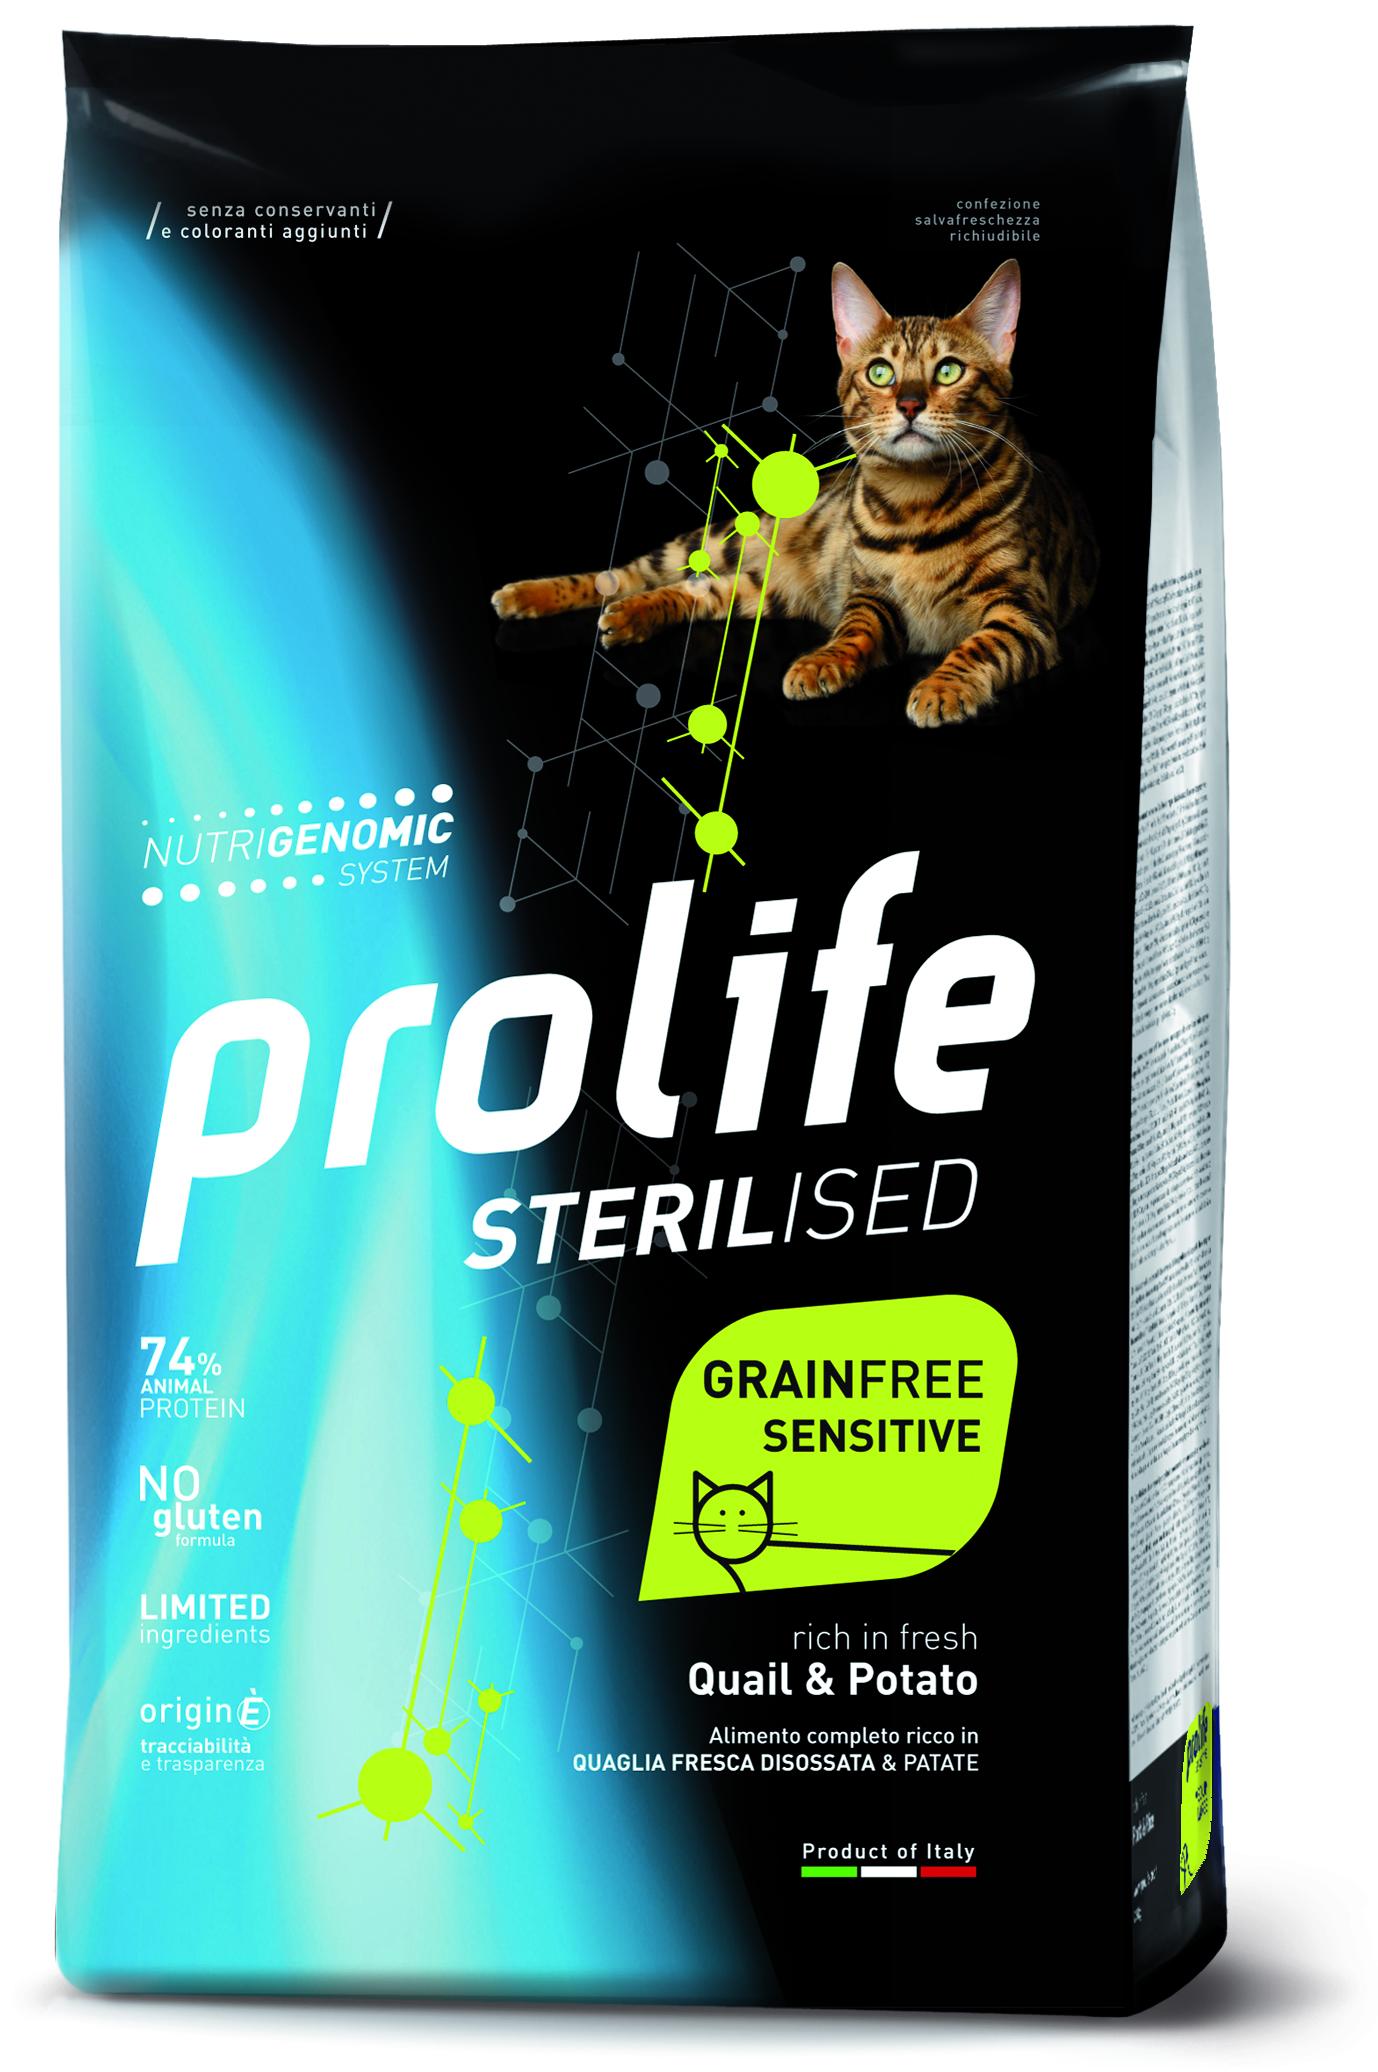 Prolife Sterialize Grainfree корм для кошек со вкусом перепёлки и картофеля, 0.4кг